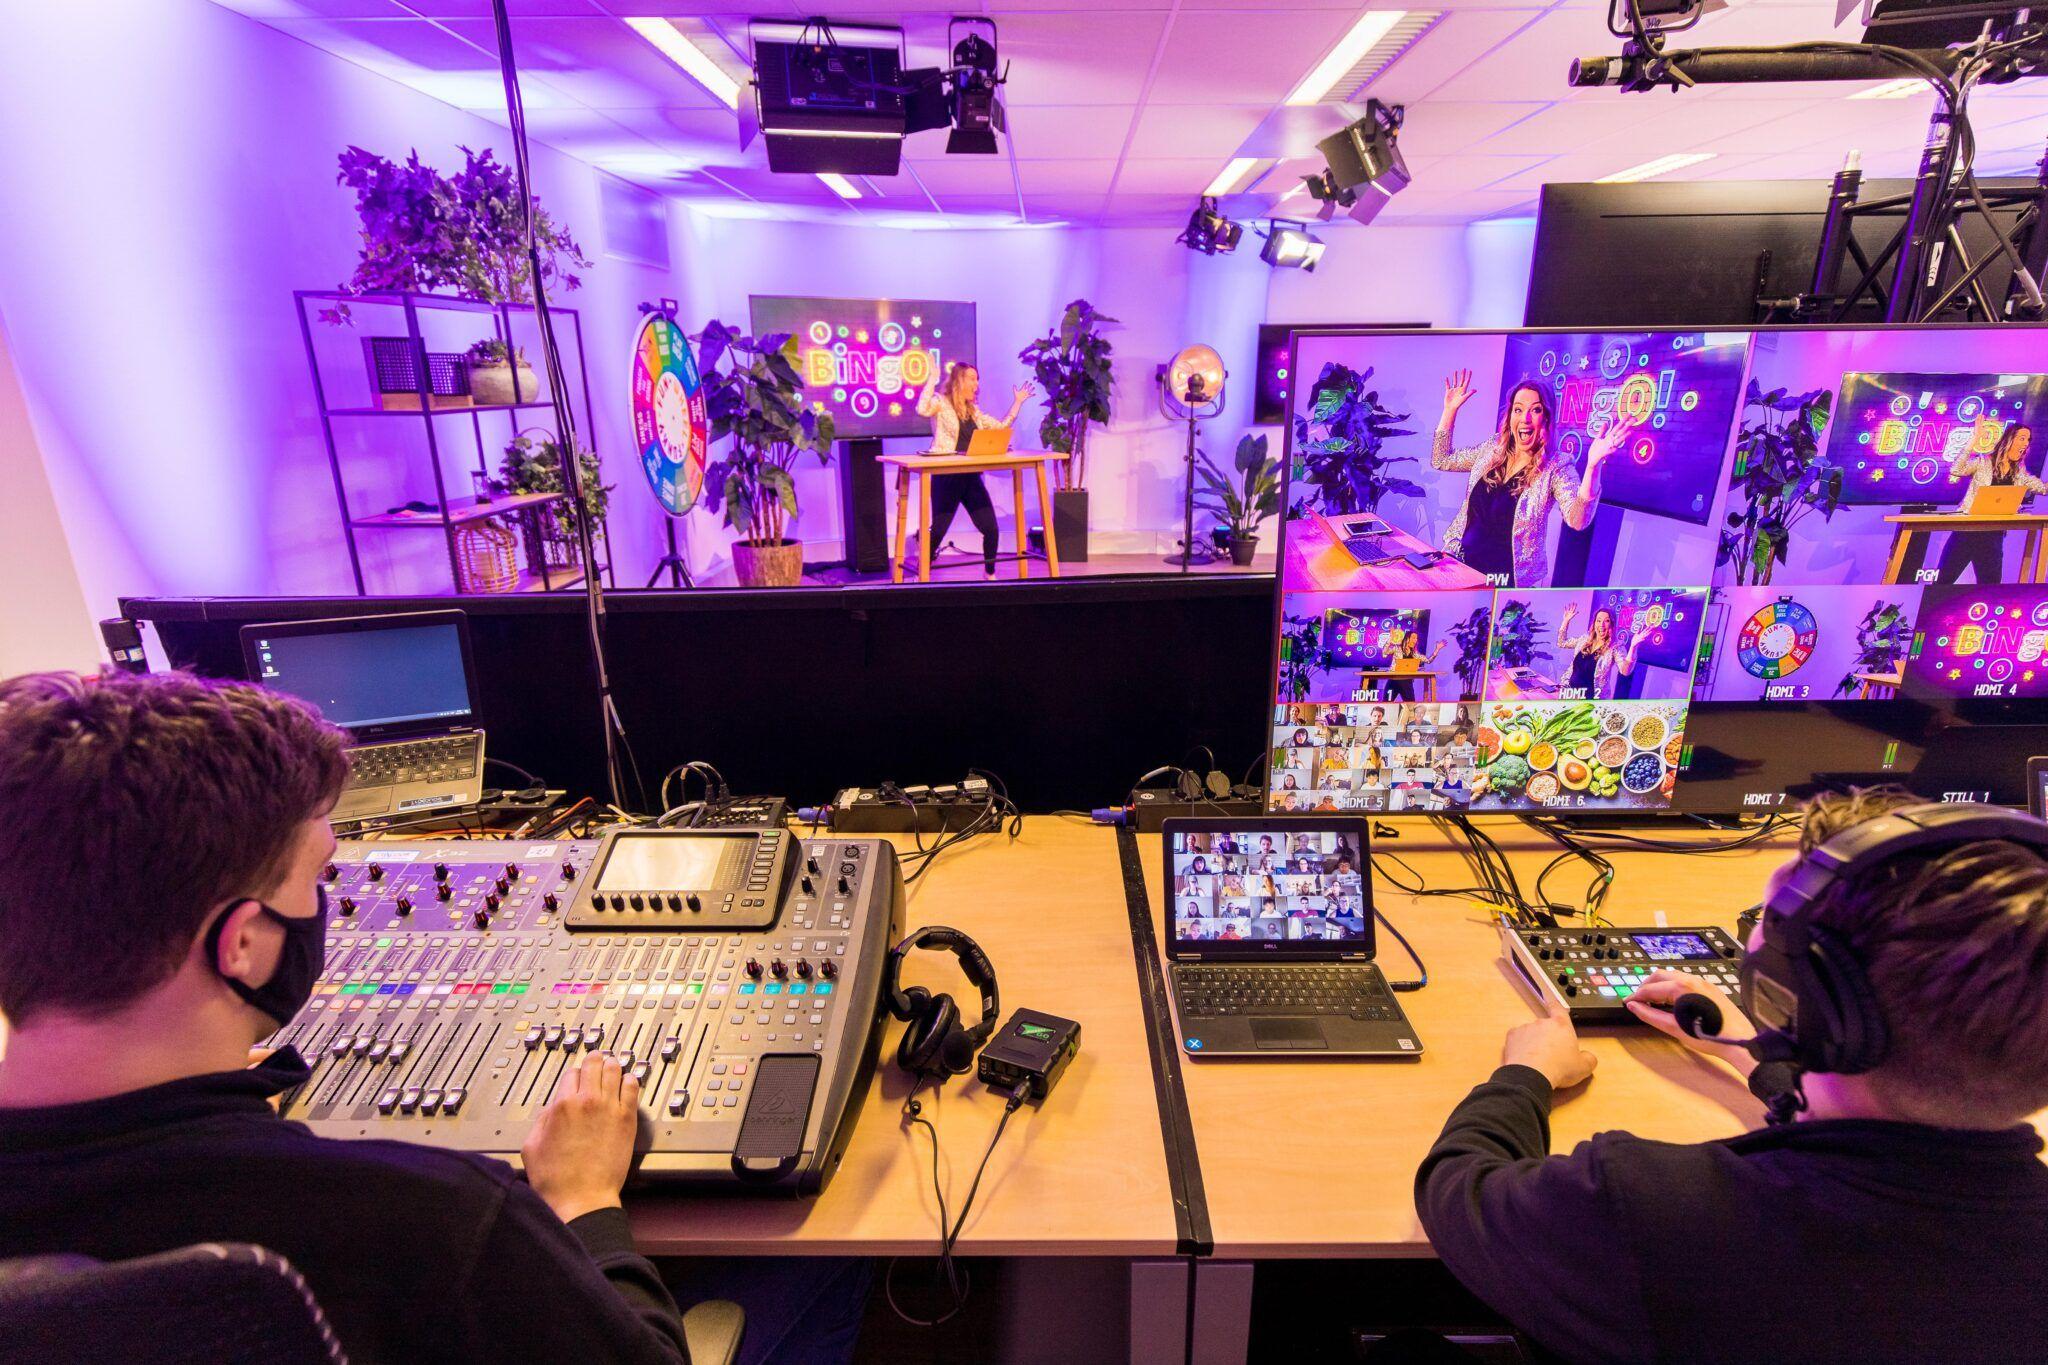 Livestream studio Rotterdam